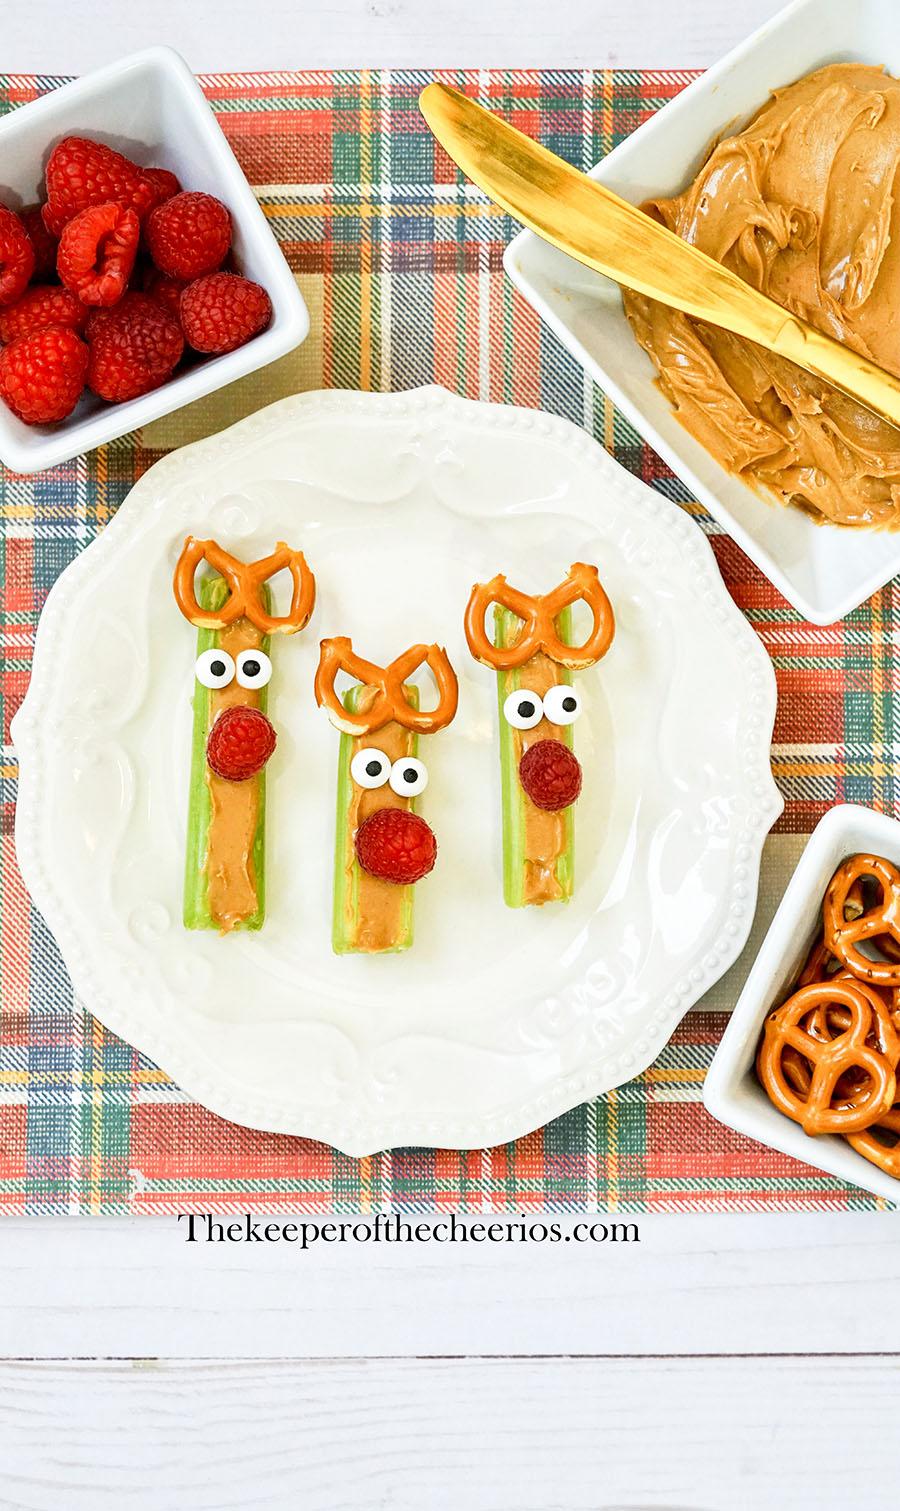 rudolph-celery-sticks-5